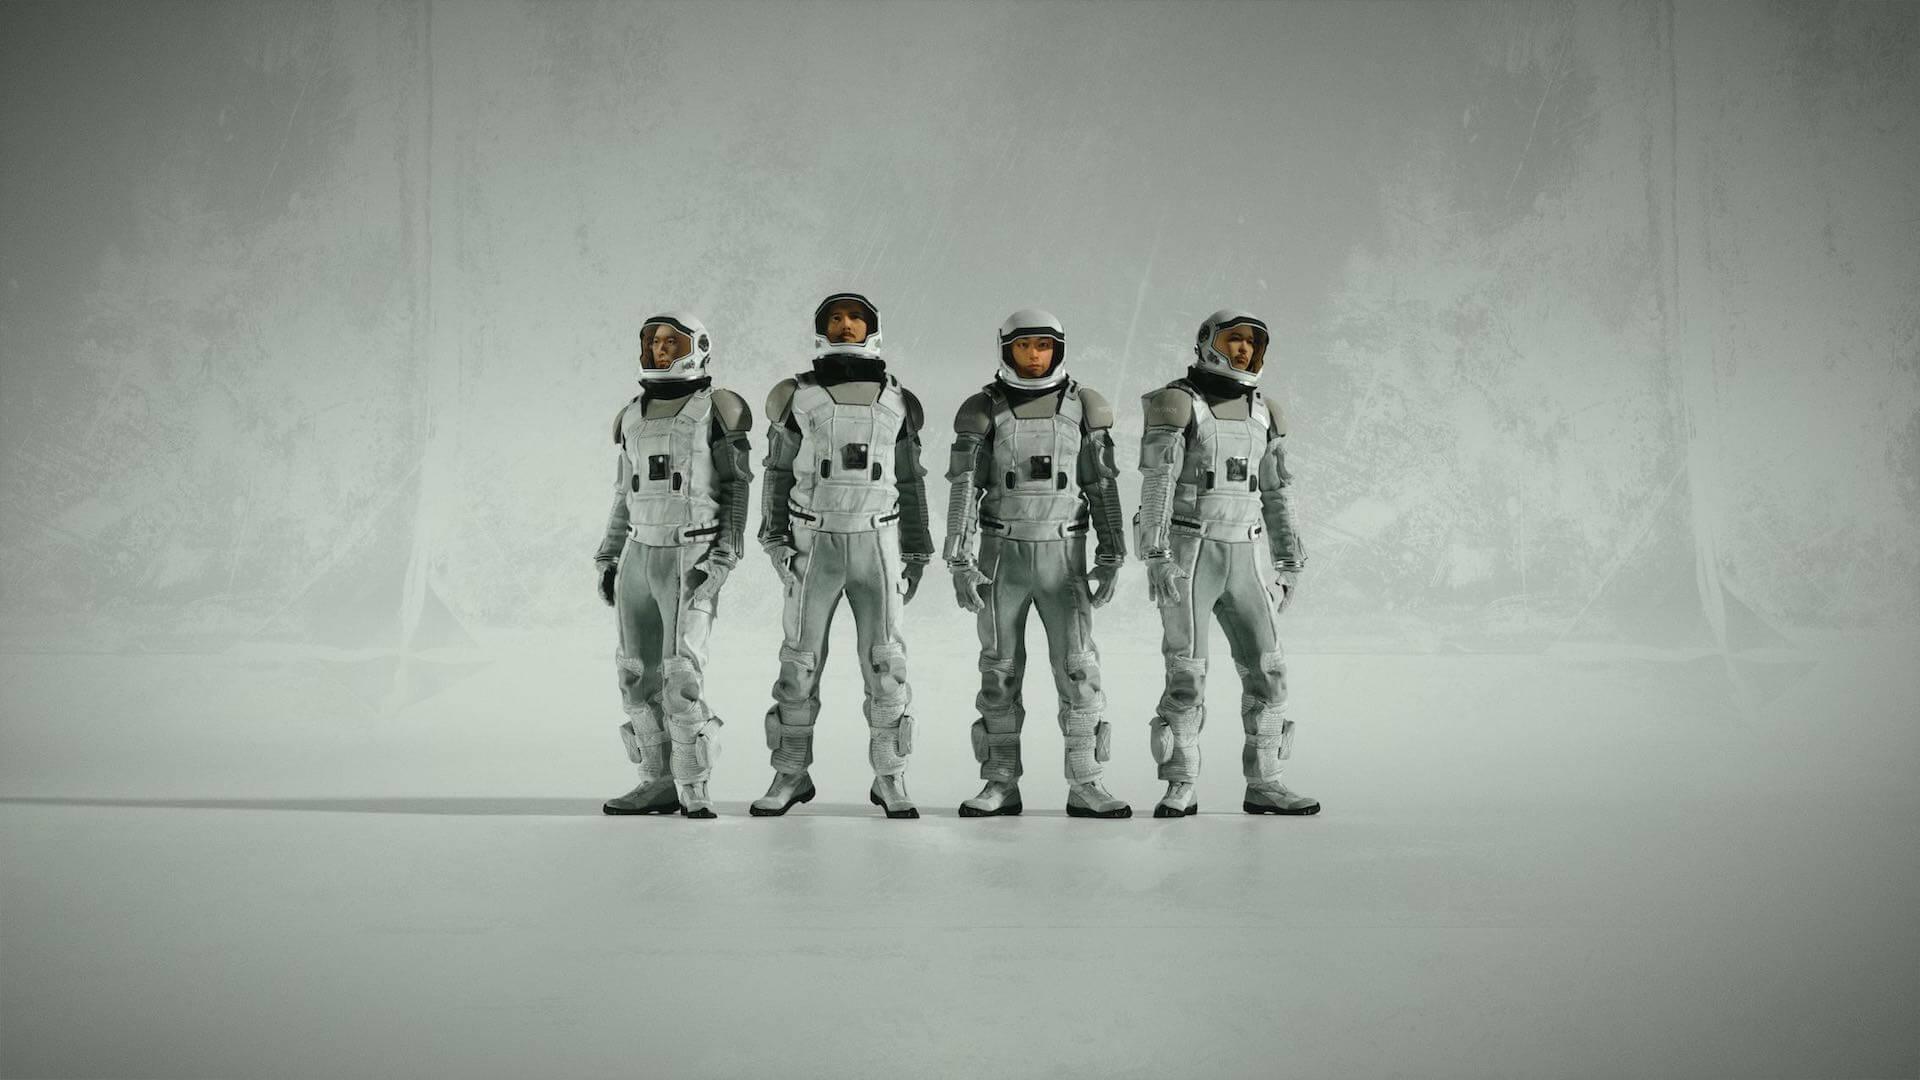 WONKのニューアルバム『EYES』に合わせたニュービジュアルが公開!リリースツアー延期も発表 music200603_wonk_2